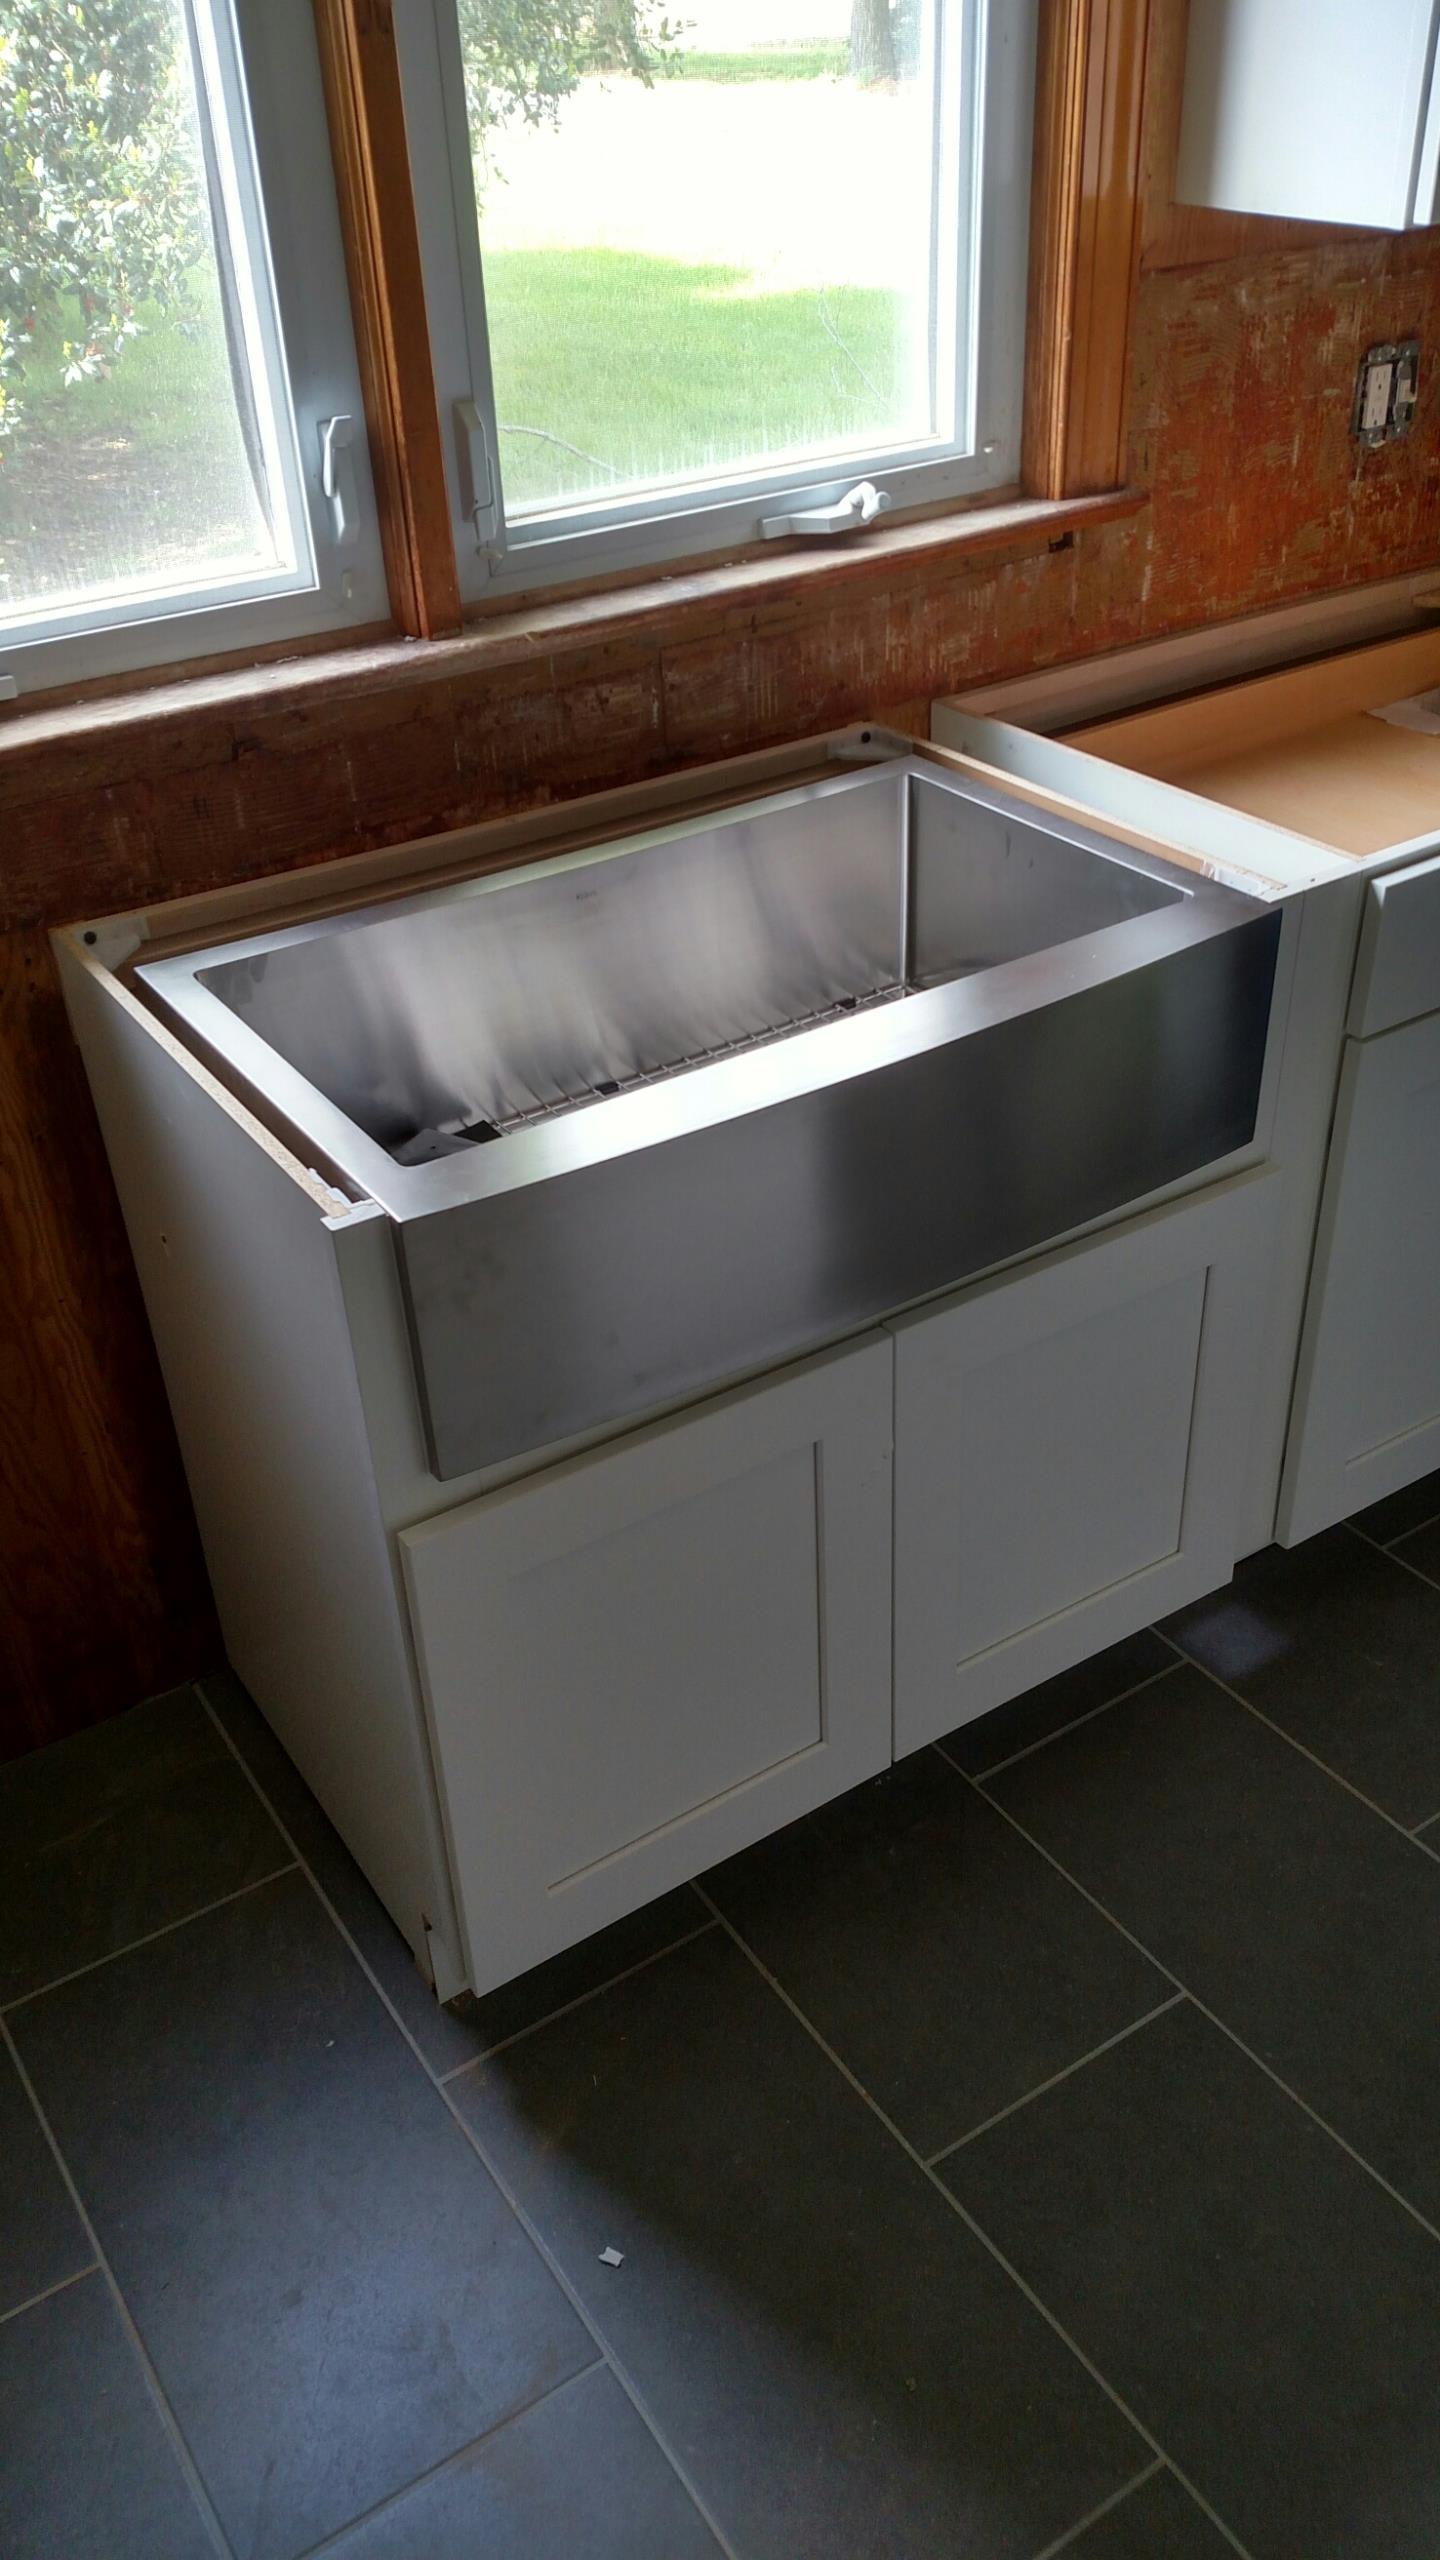 Ocean Kitchen And Bath Wilmington De Reviews